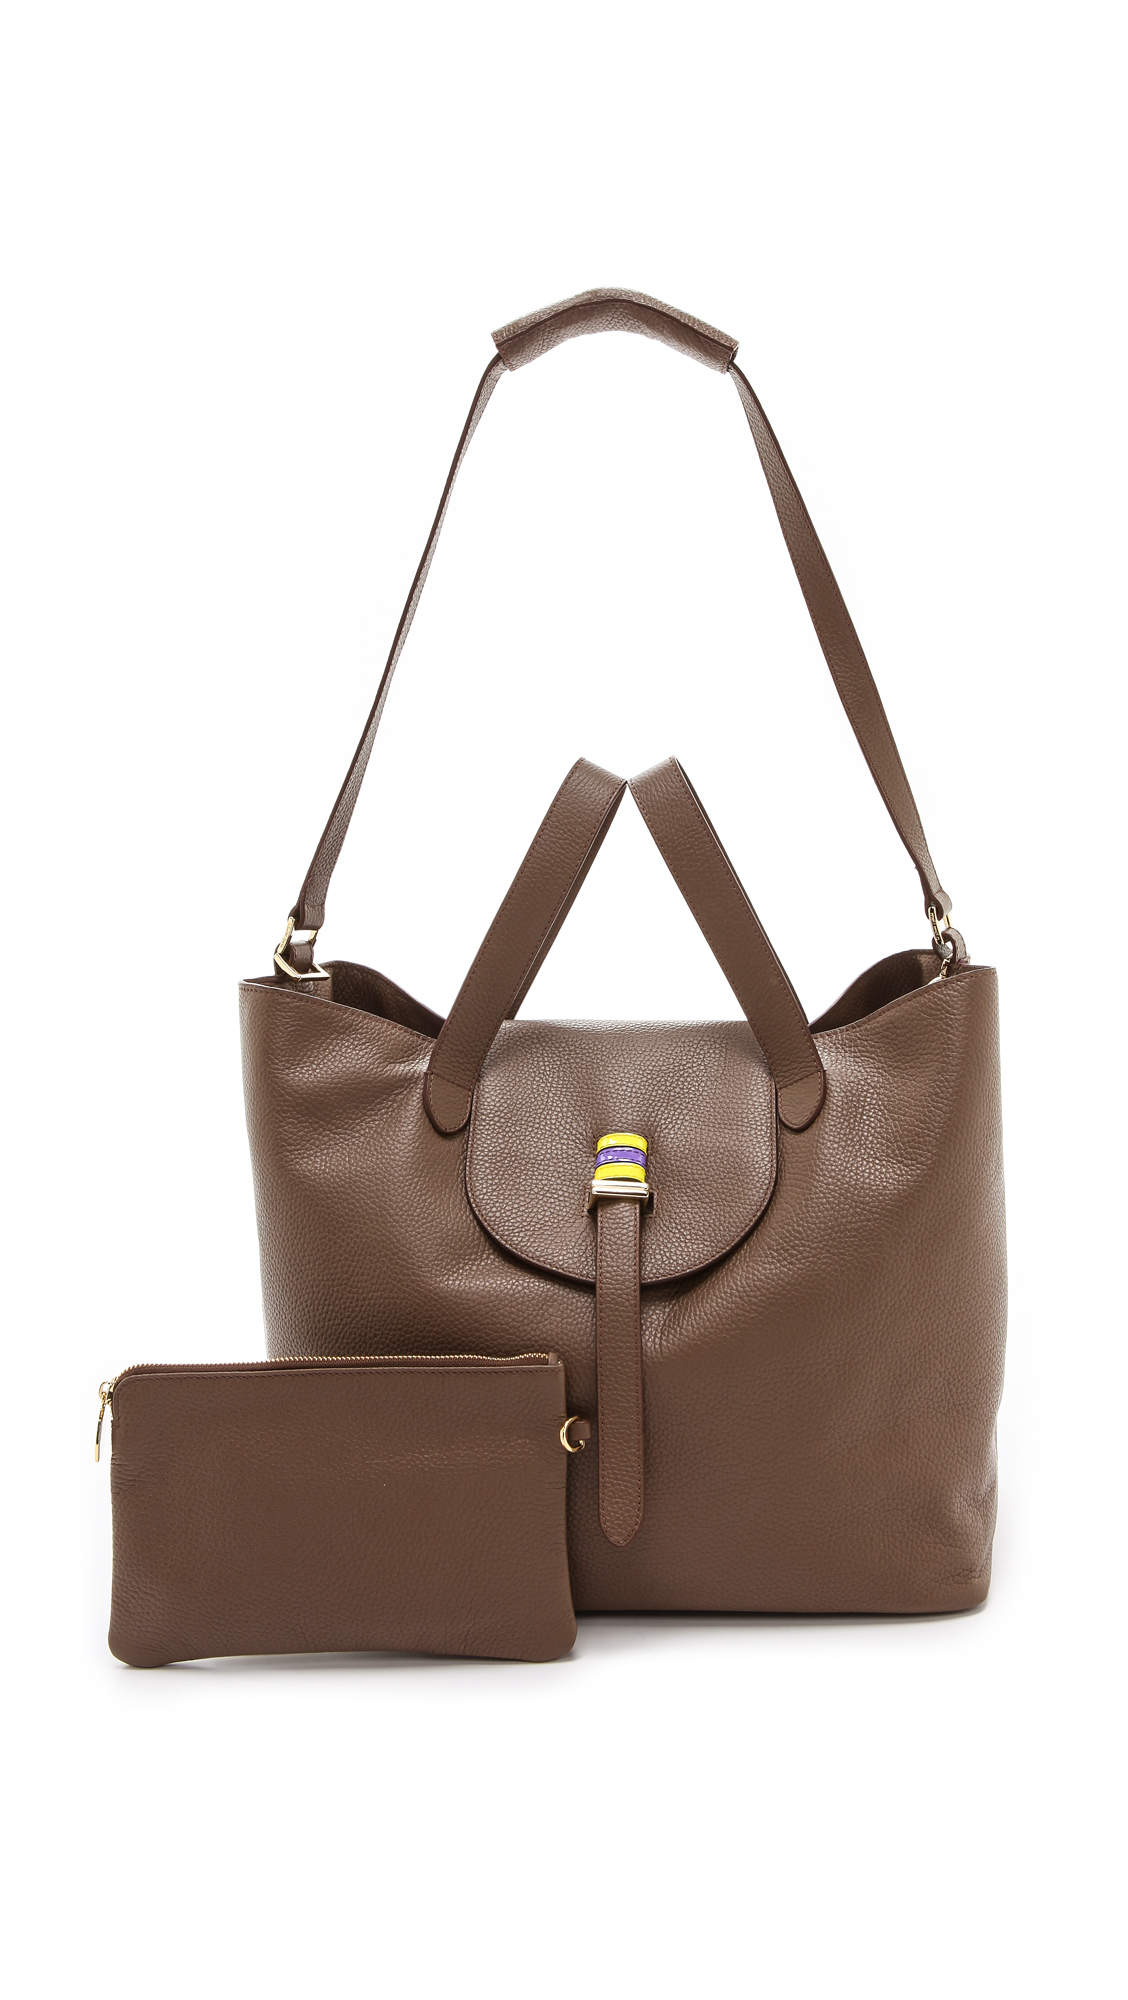 meli melo thela handbag in brown lyst. Black Bedroom Furniture Sets. Home Design Ideas